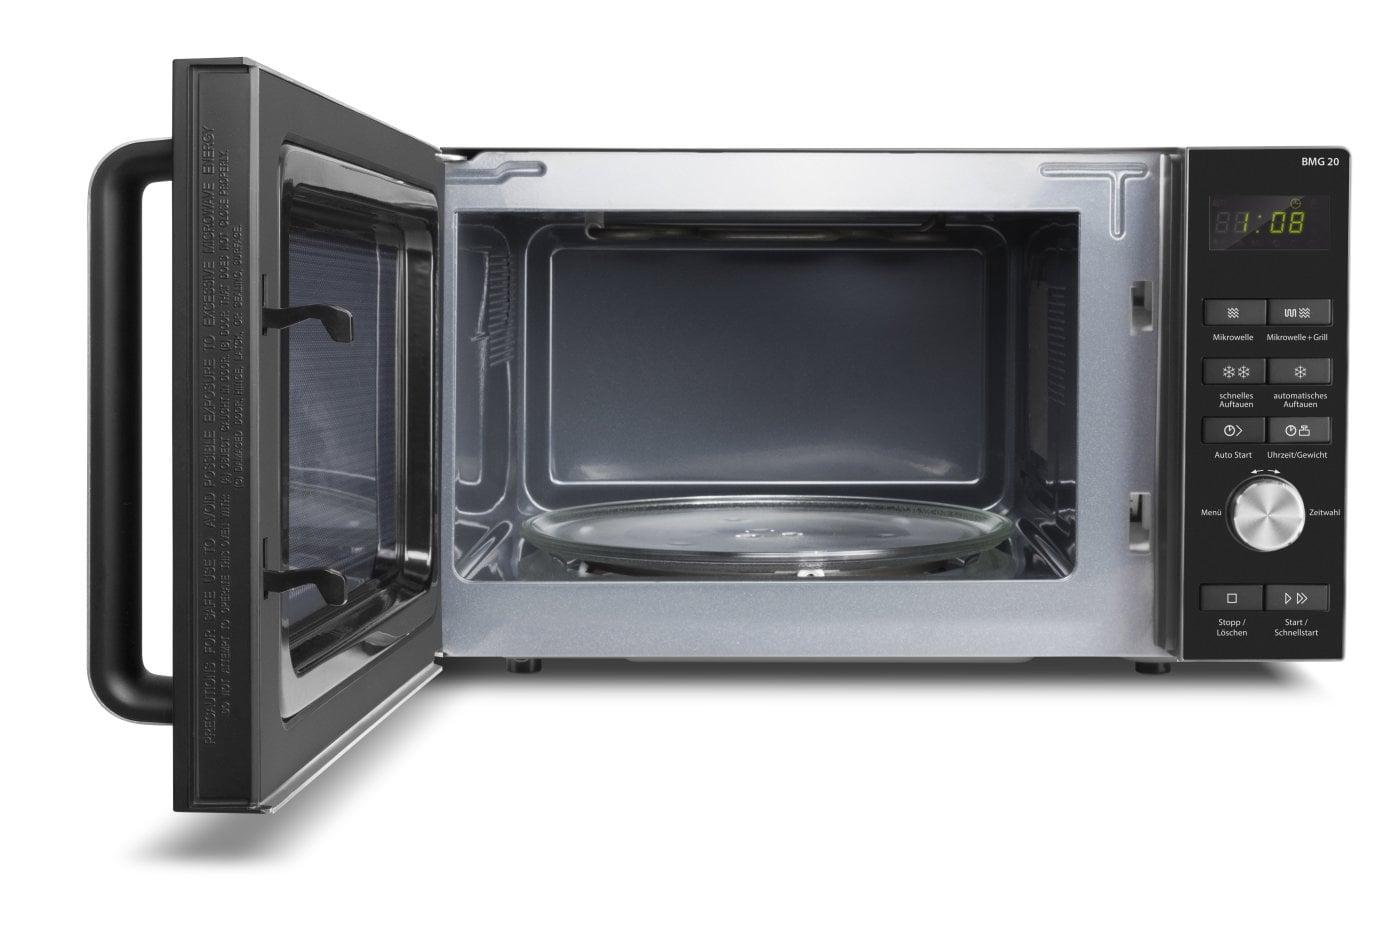 Design Microwave Grill Bmg 20 Caso